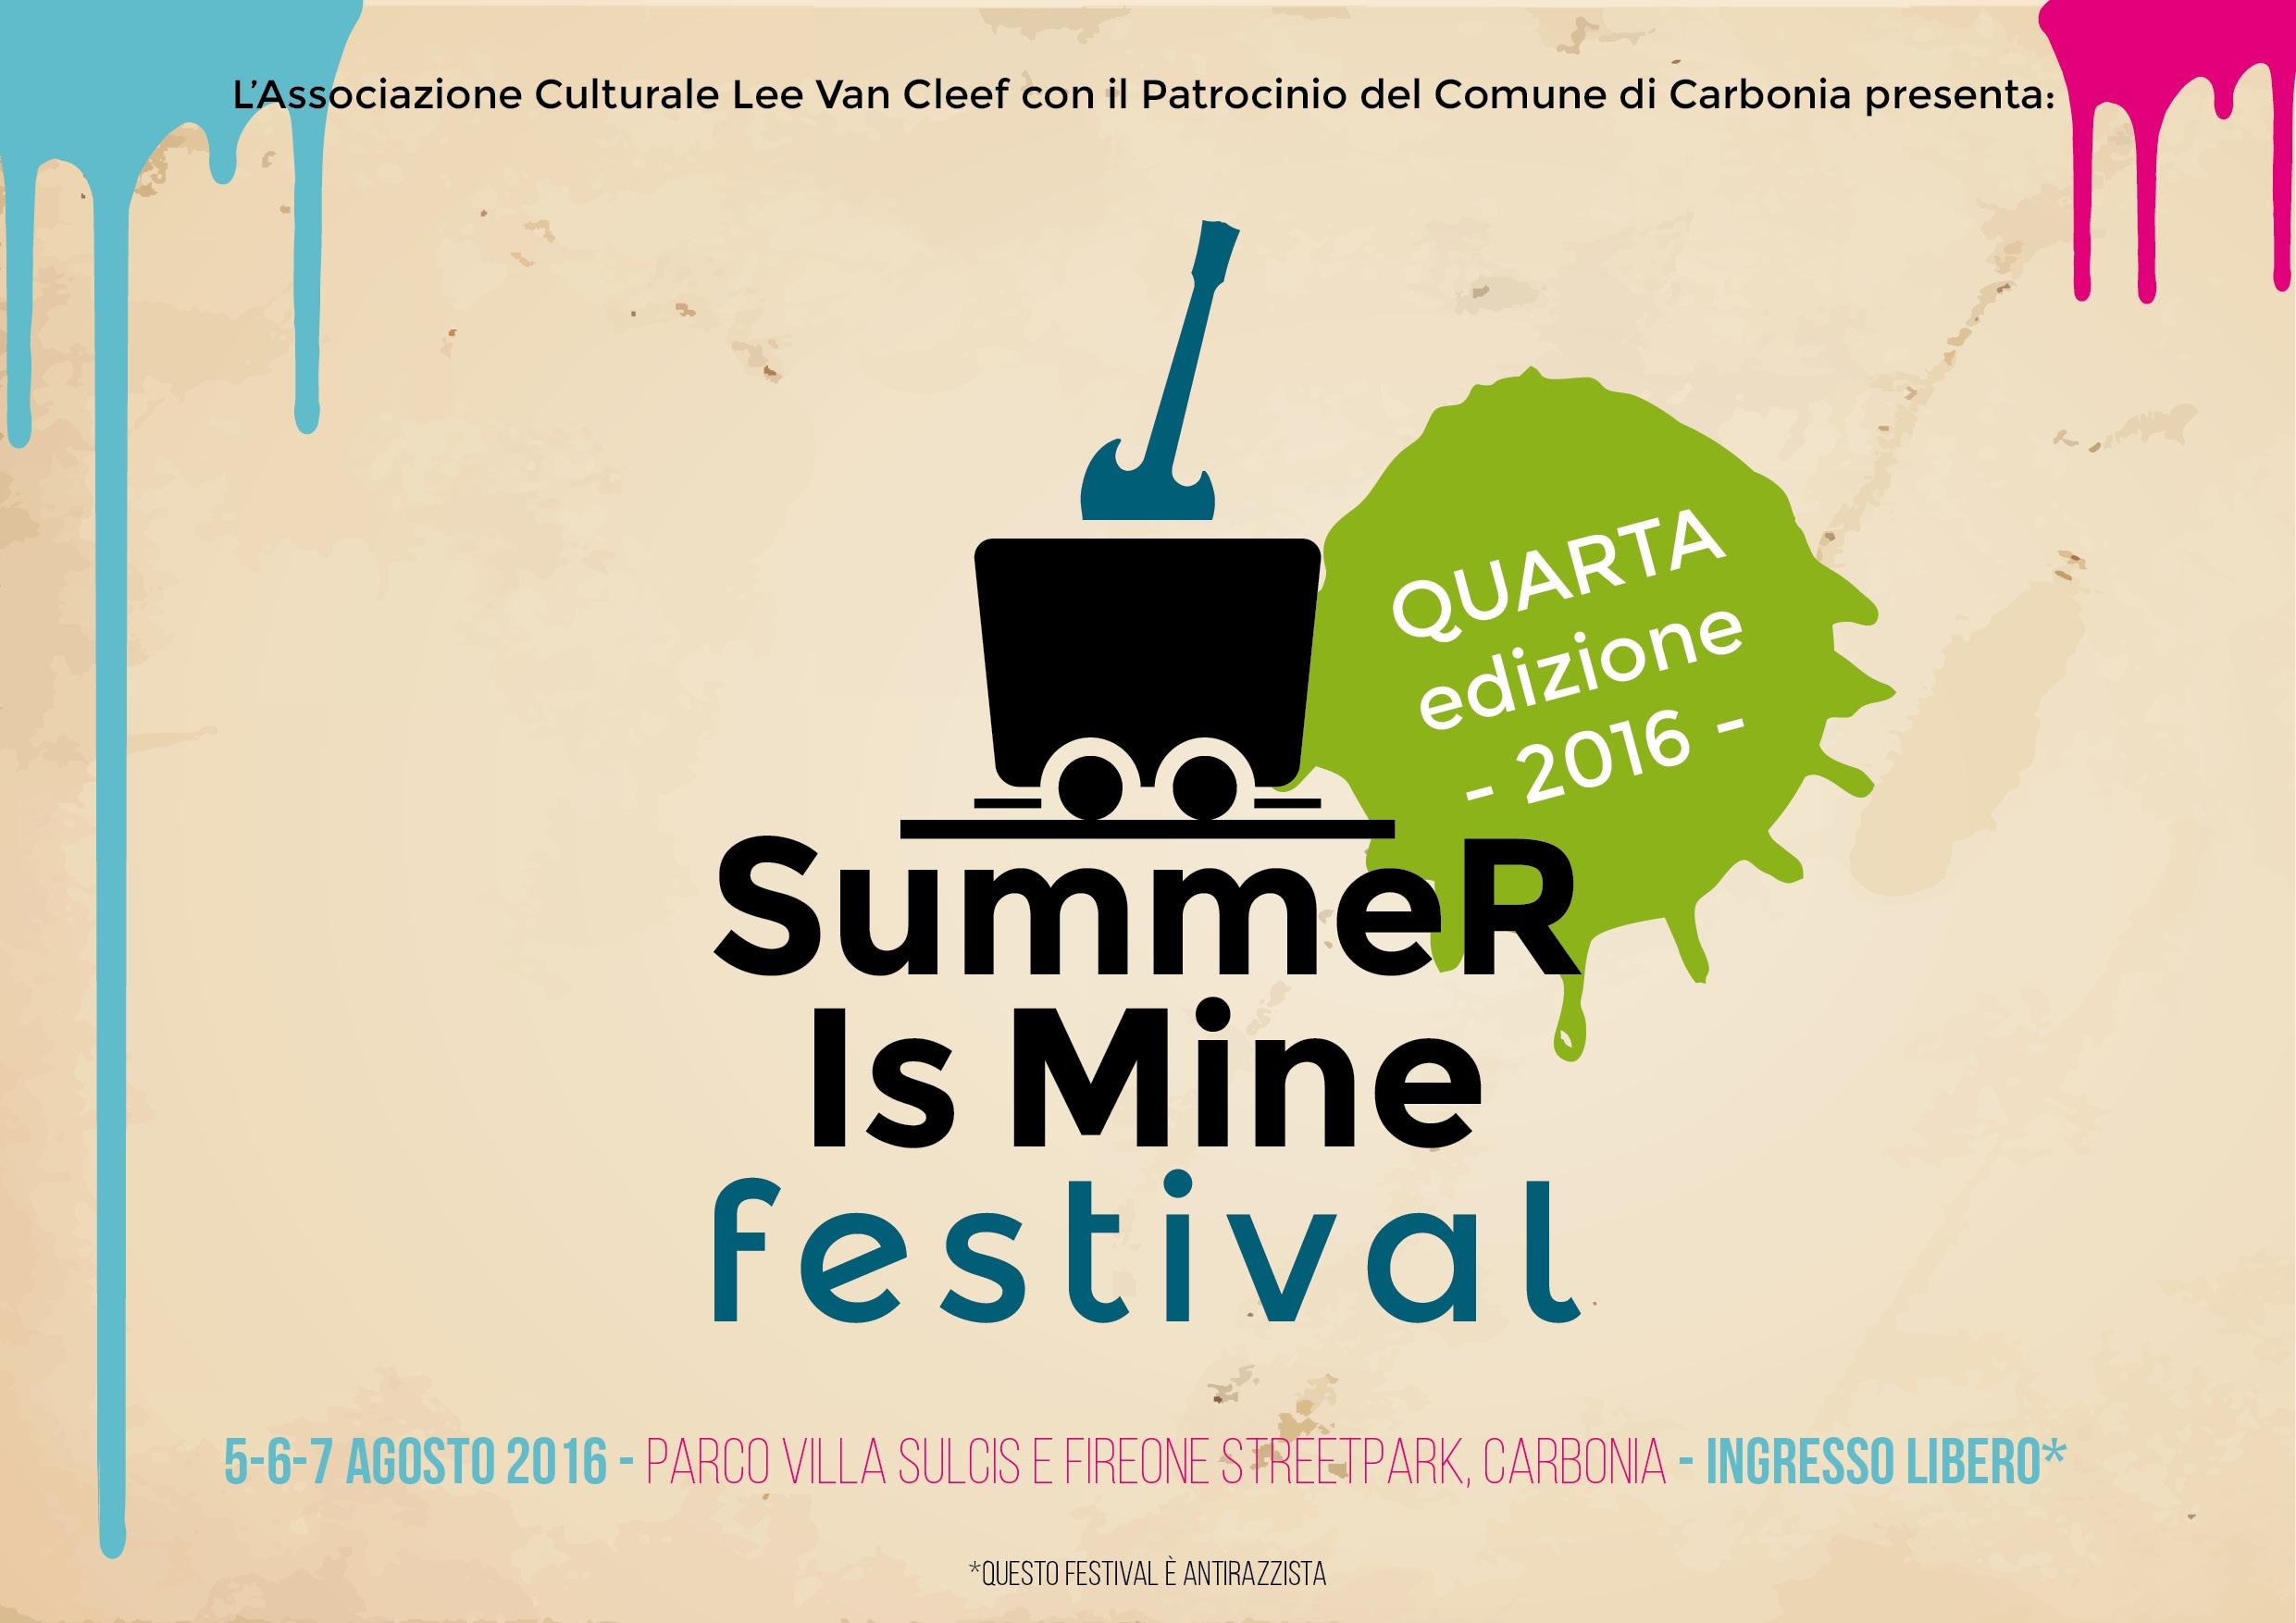 Summer Is Mine Festival Carbonia 5-6-7 Agosto 2016